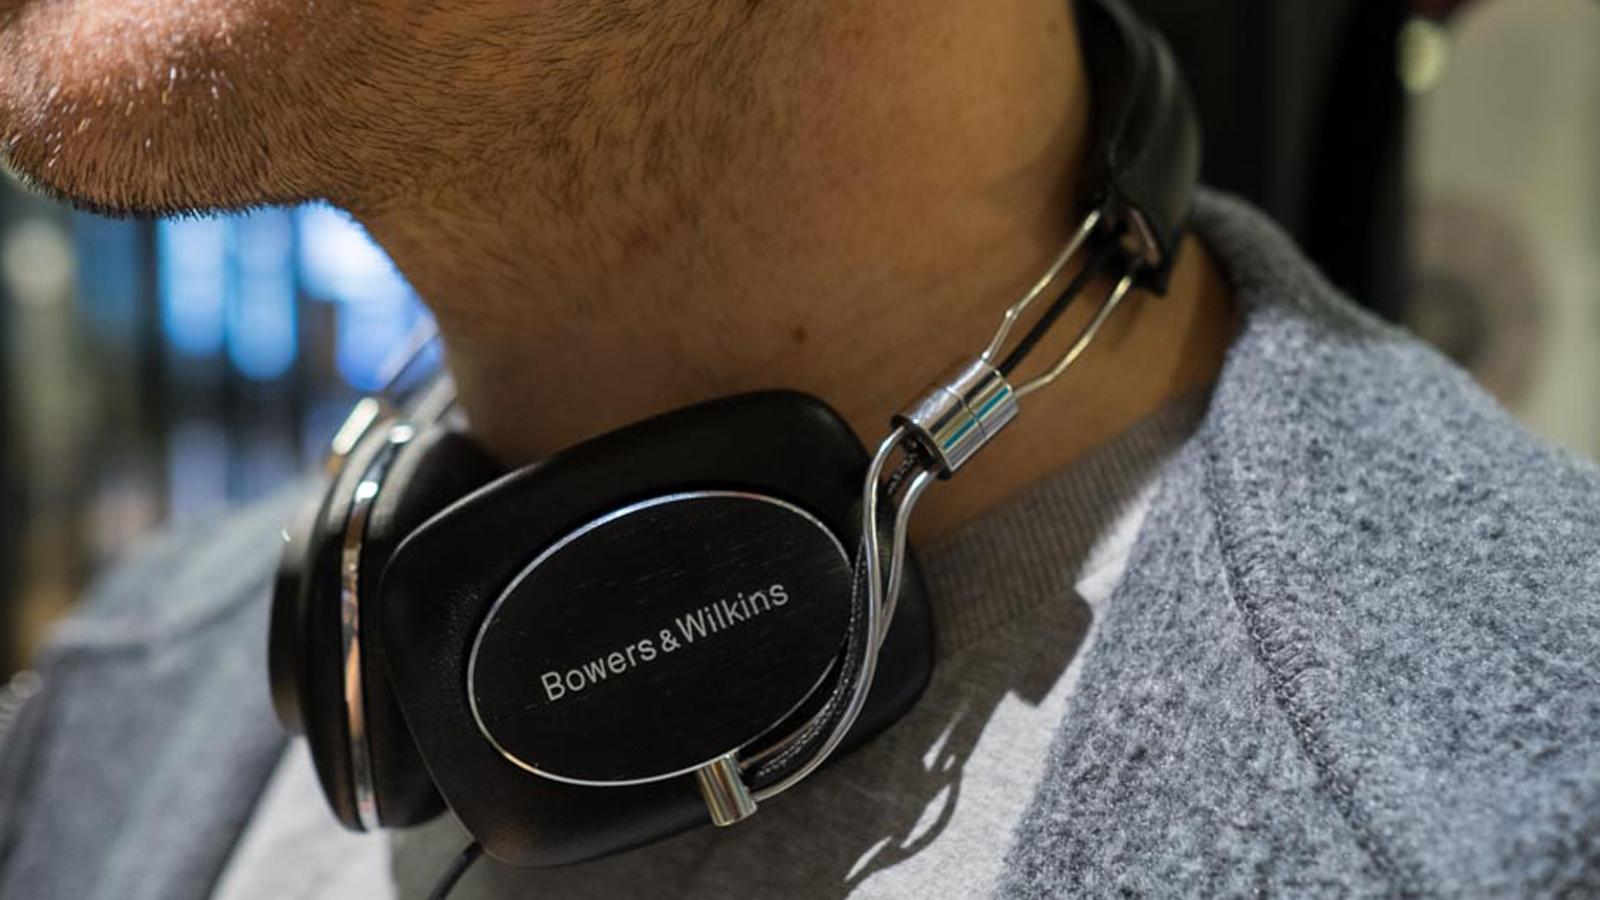 Sweepstake iphone 7 headphones argos